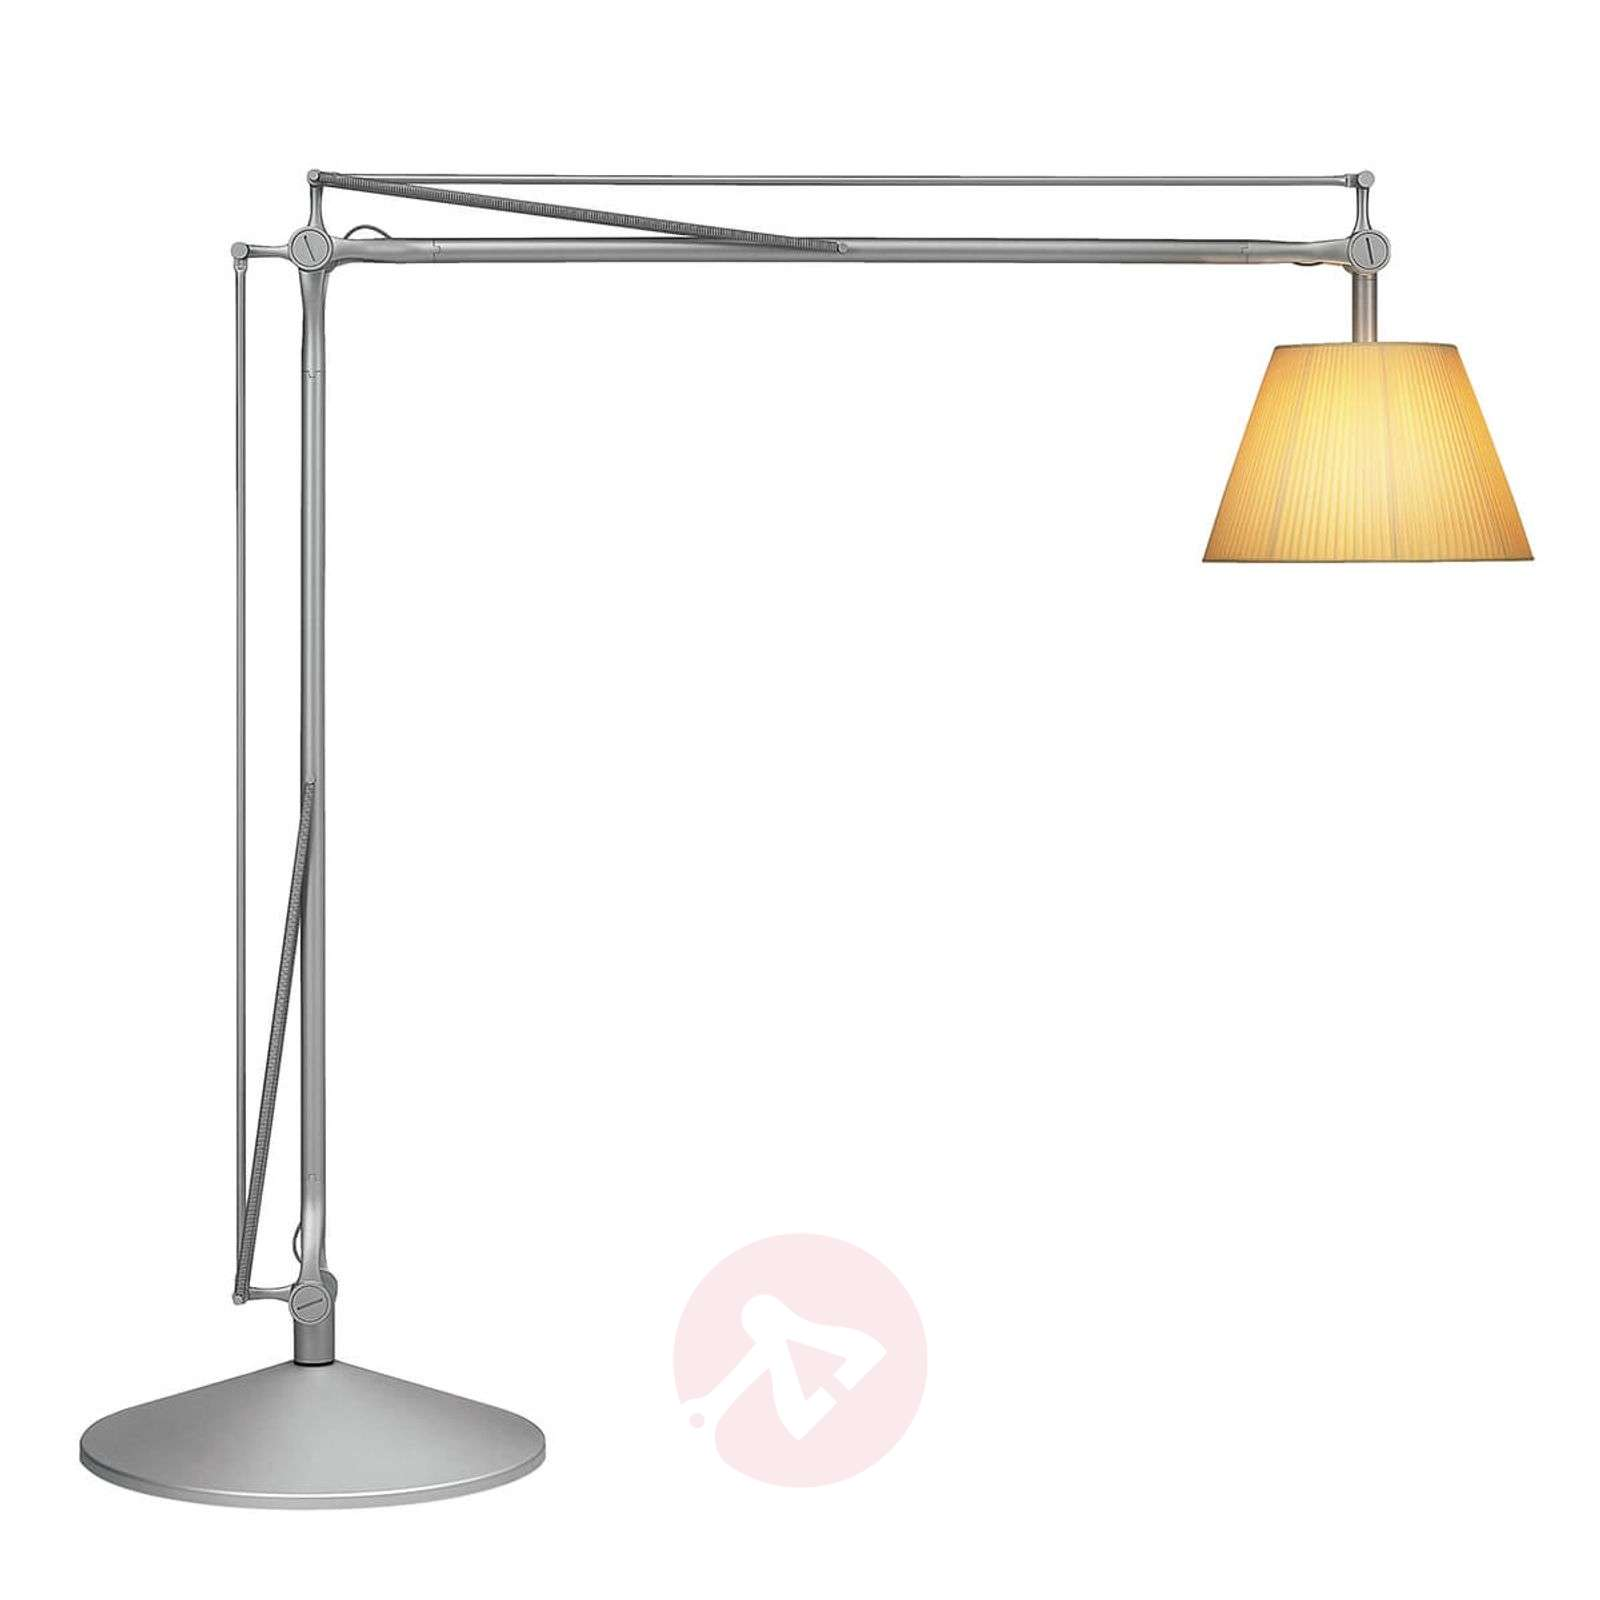 Superarchimoon Floor Lamp Large Dimensions-3510151-01